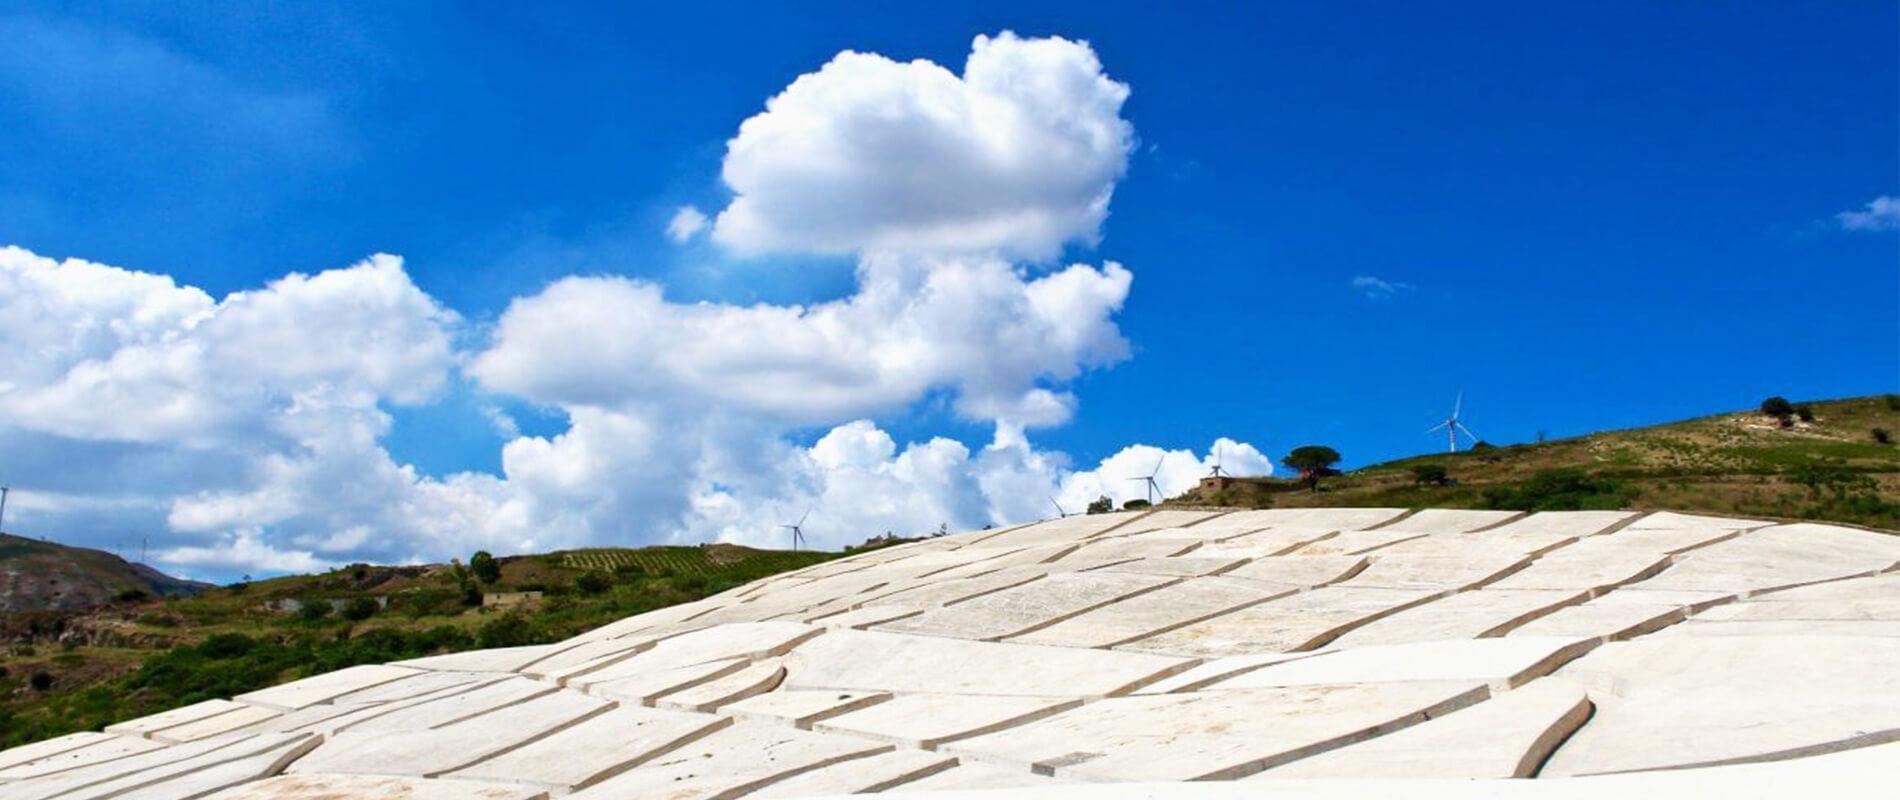 The Great Crack of Burri's Gigantic Land Art Work